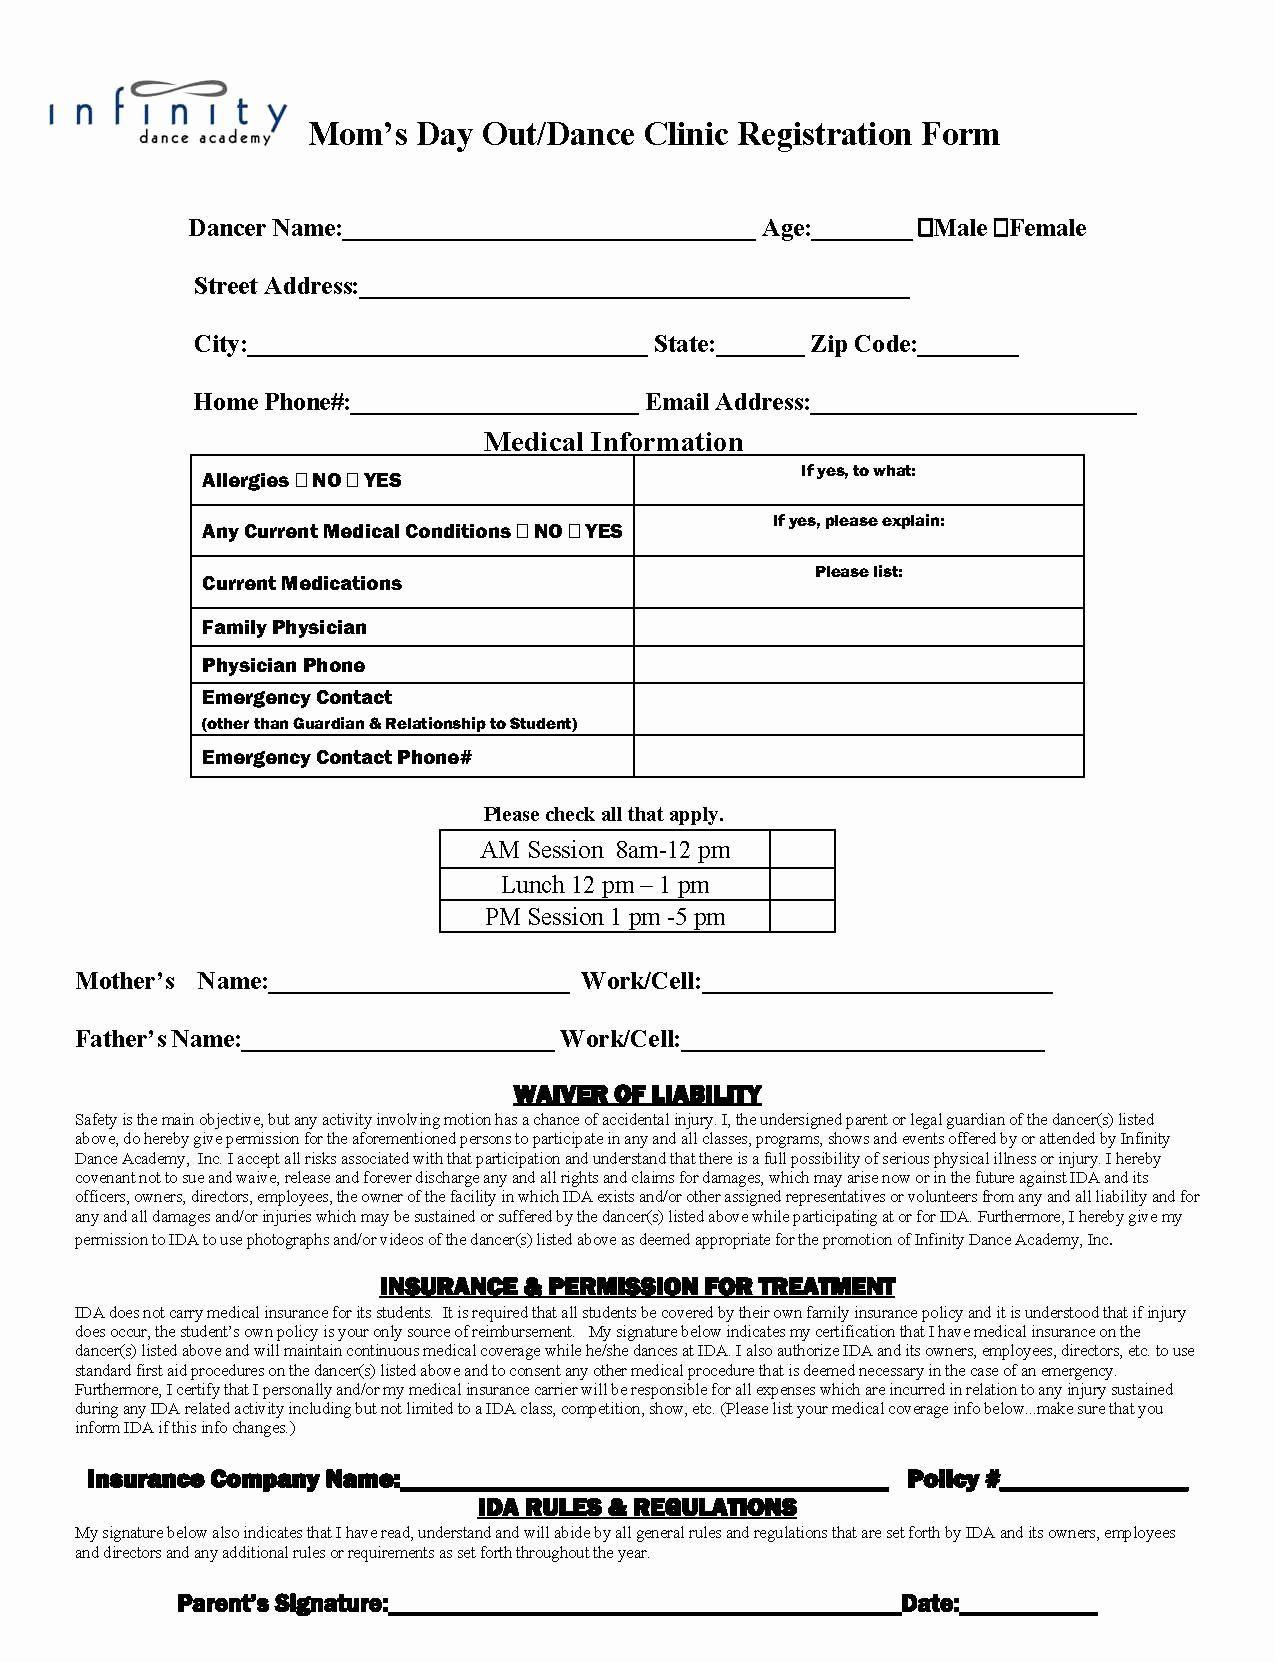 Dance registration form template new dance school